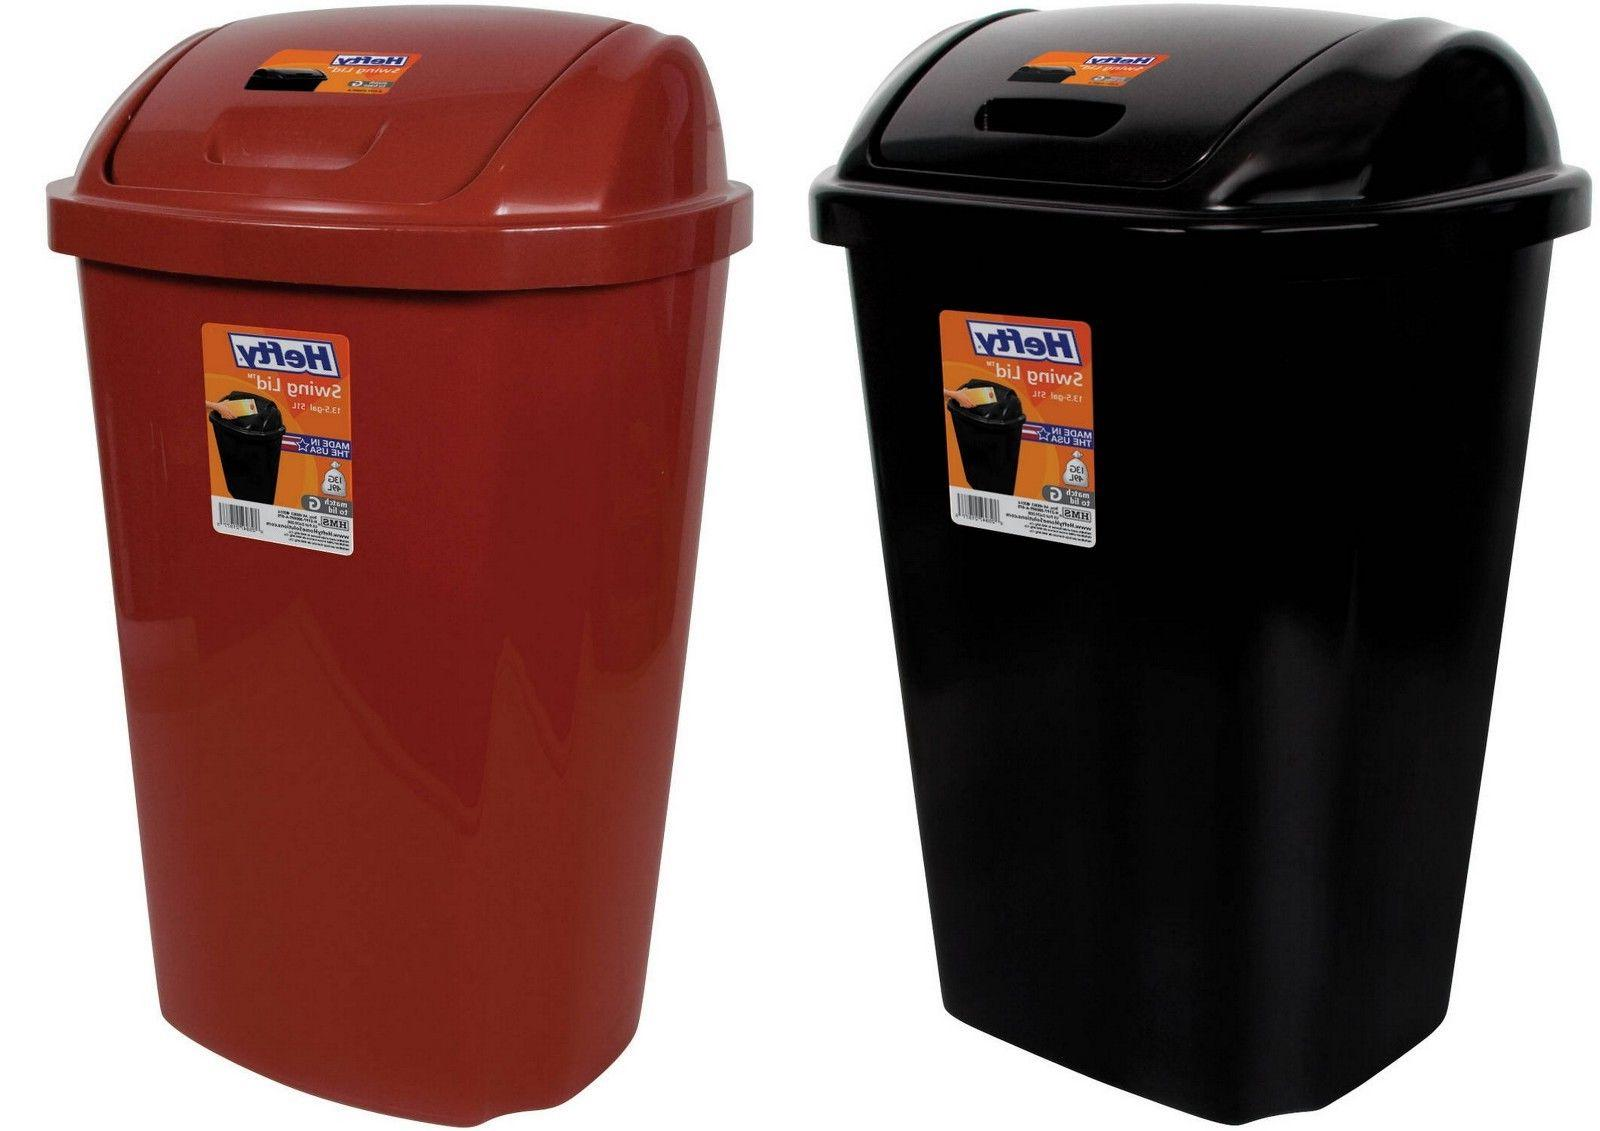 garbage can kitchen wastebasket with swing lid